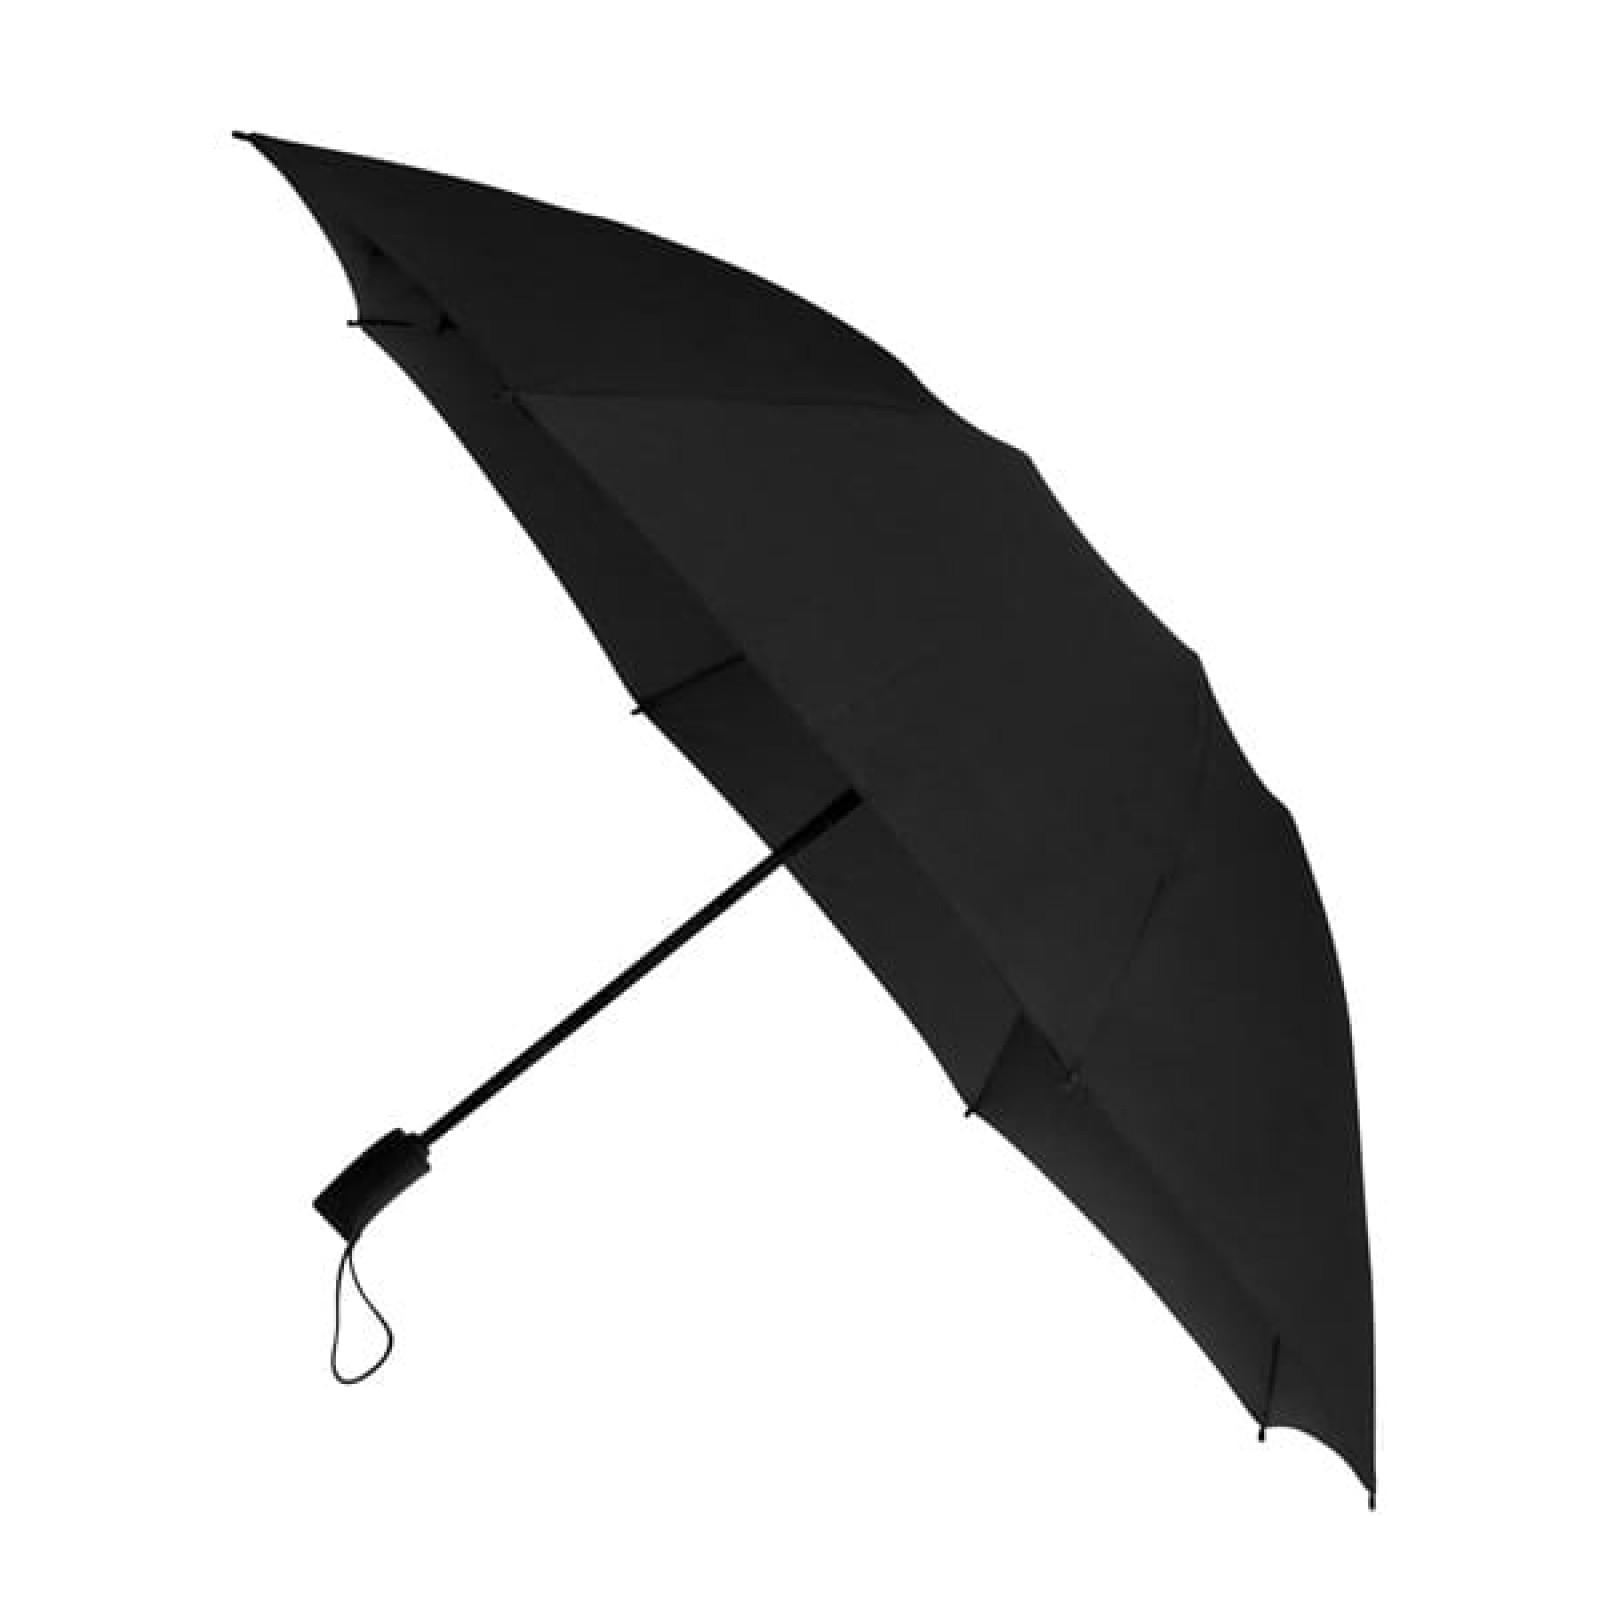 Automatic Folding Reverse Umbrella (Black) - Impliva